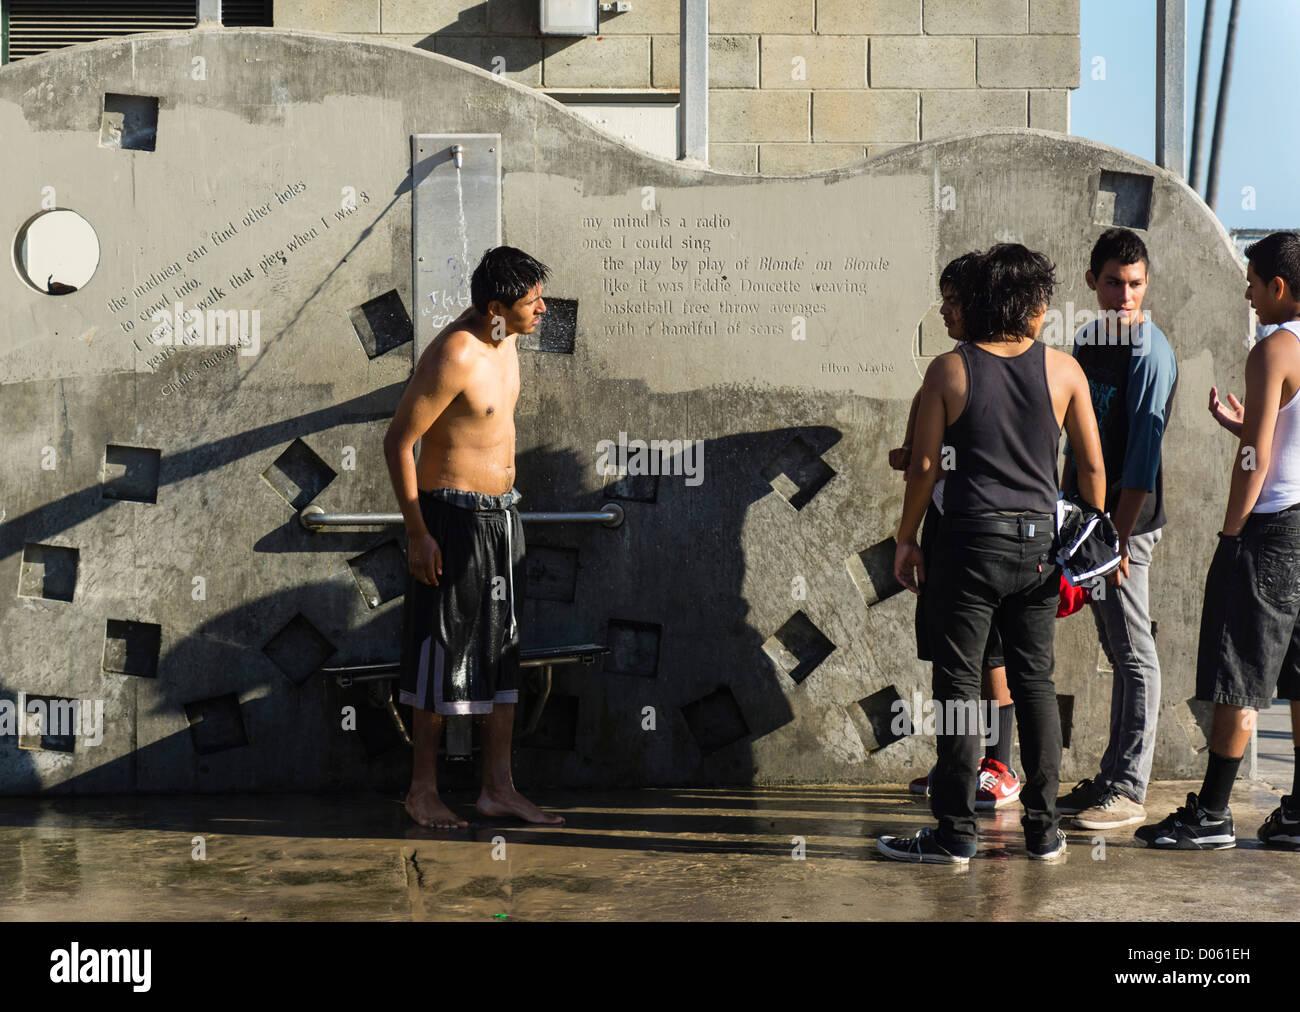 Venice Beach, LA, California seaside resort   youths at a public